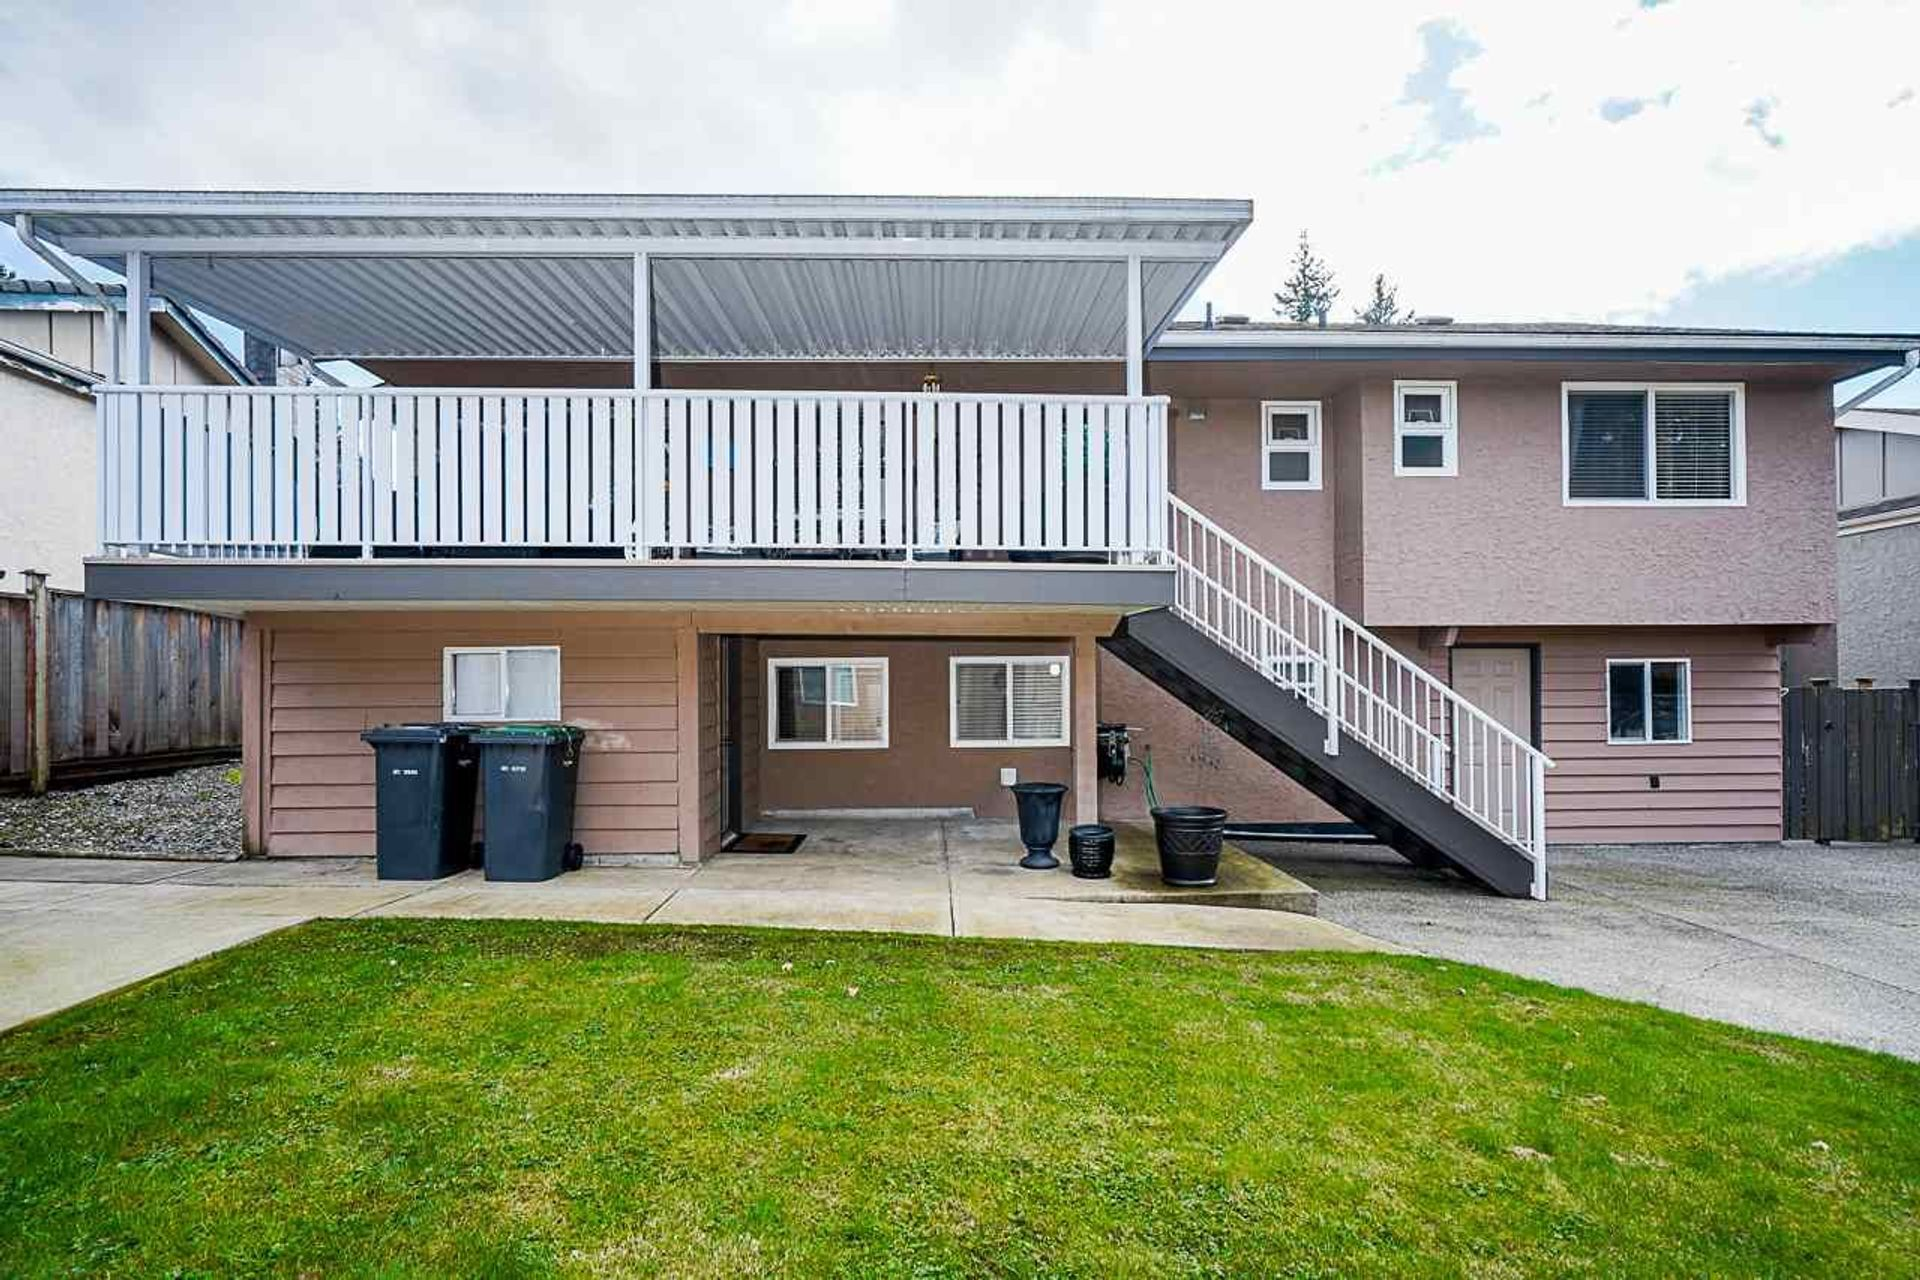 909-runnymede-avenue-coquitlam-west-coquitlam-29 of 909 Runnymede Avenue, Coquitlam West, Coquitlam